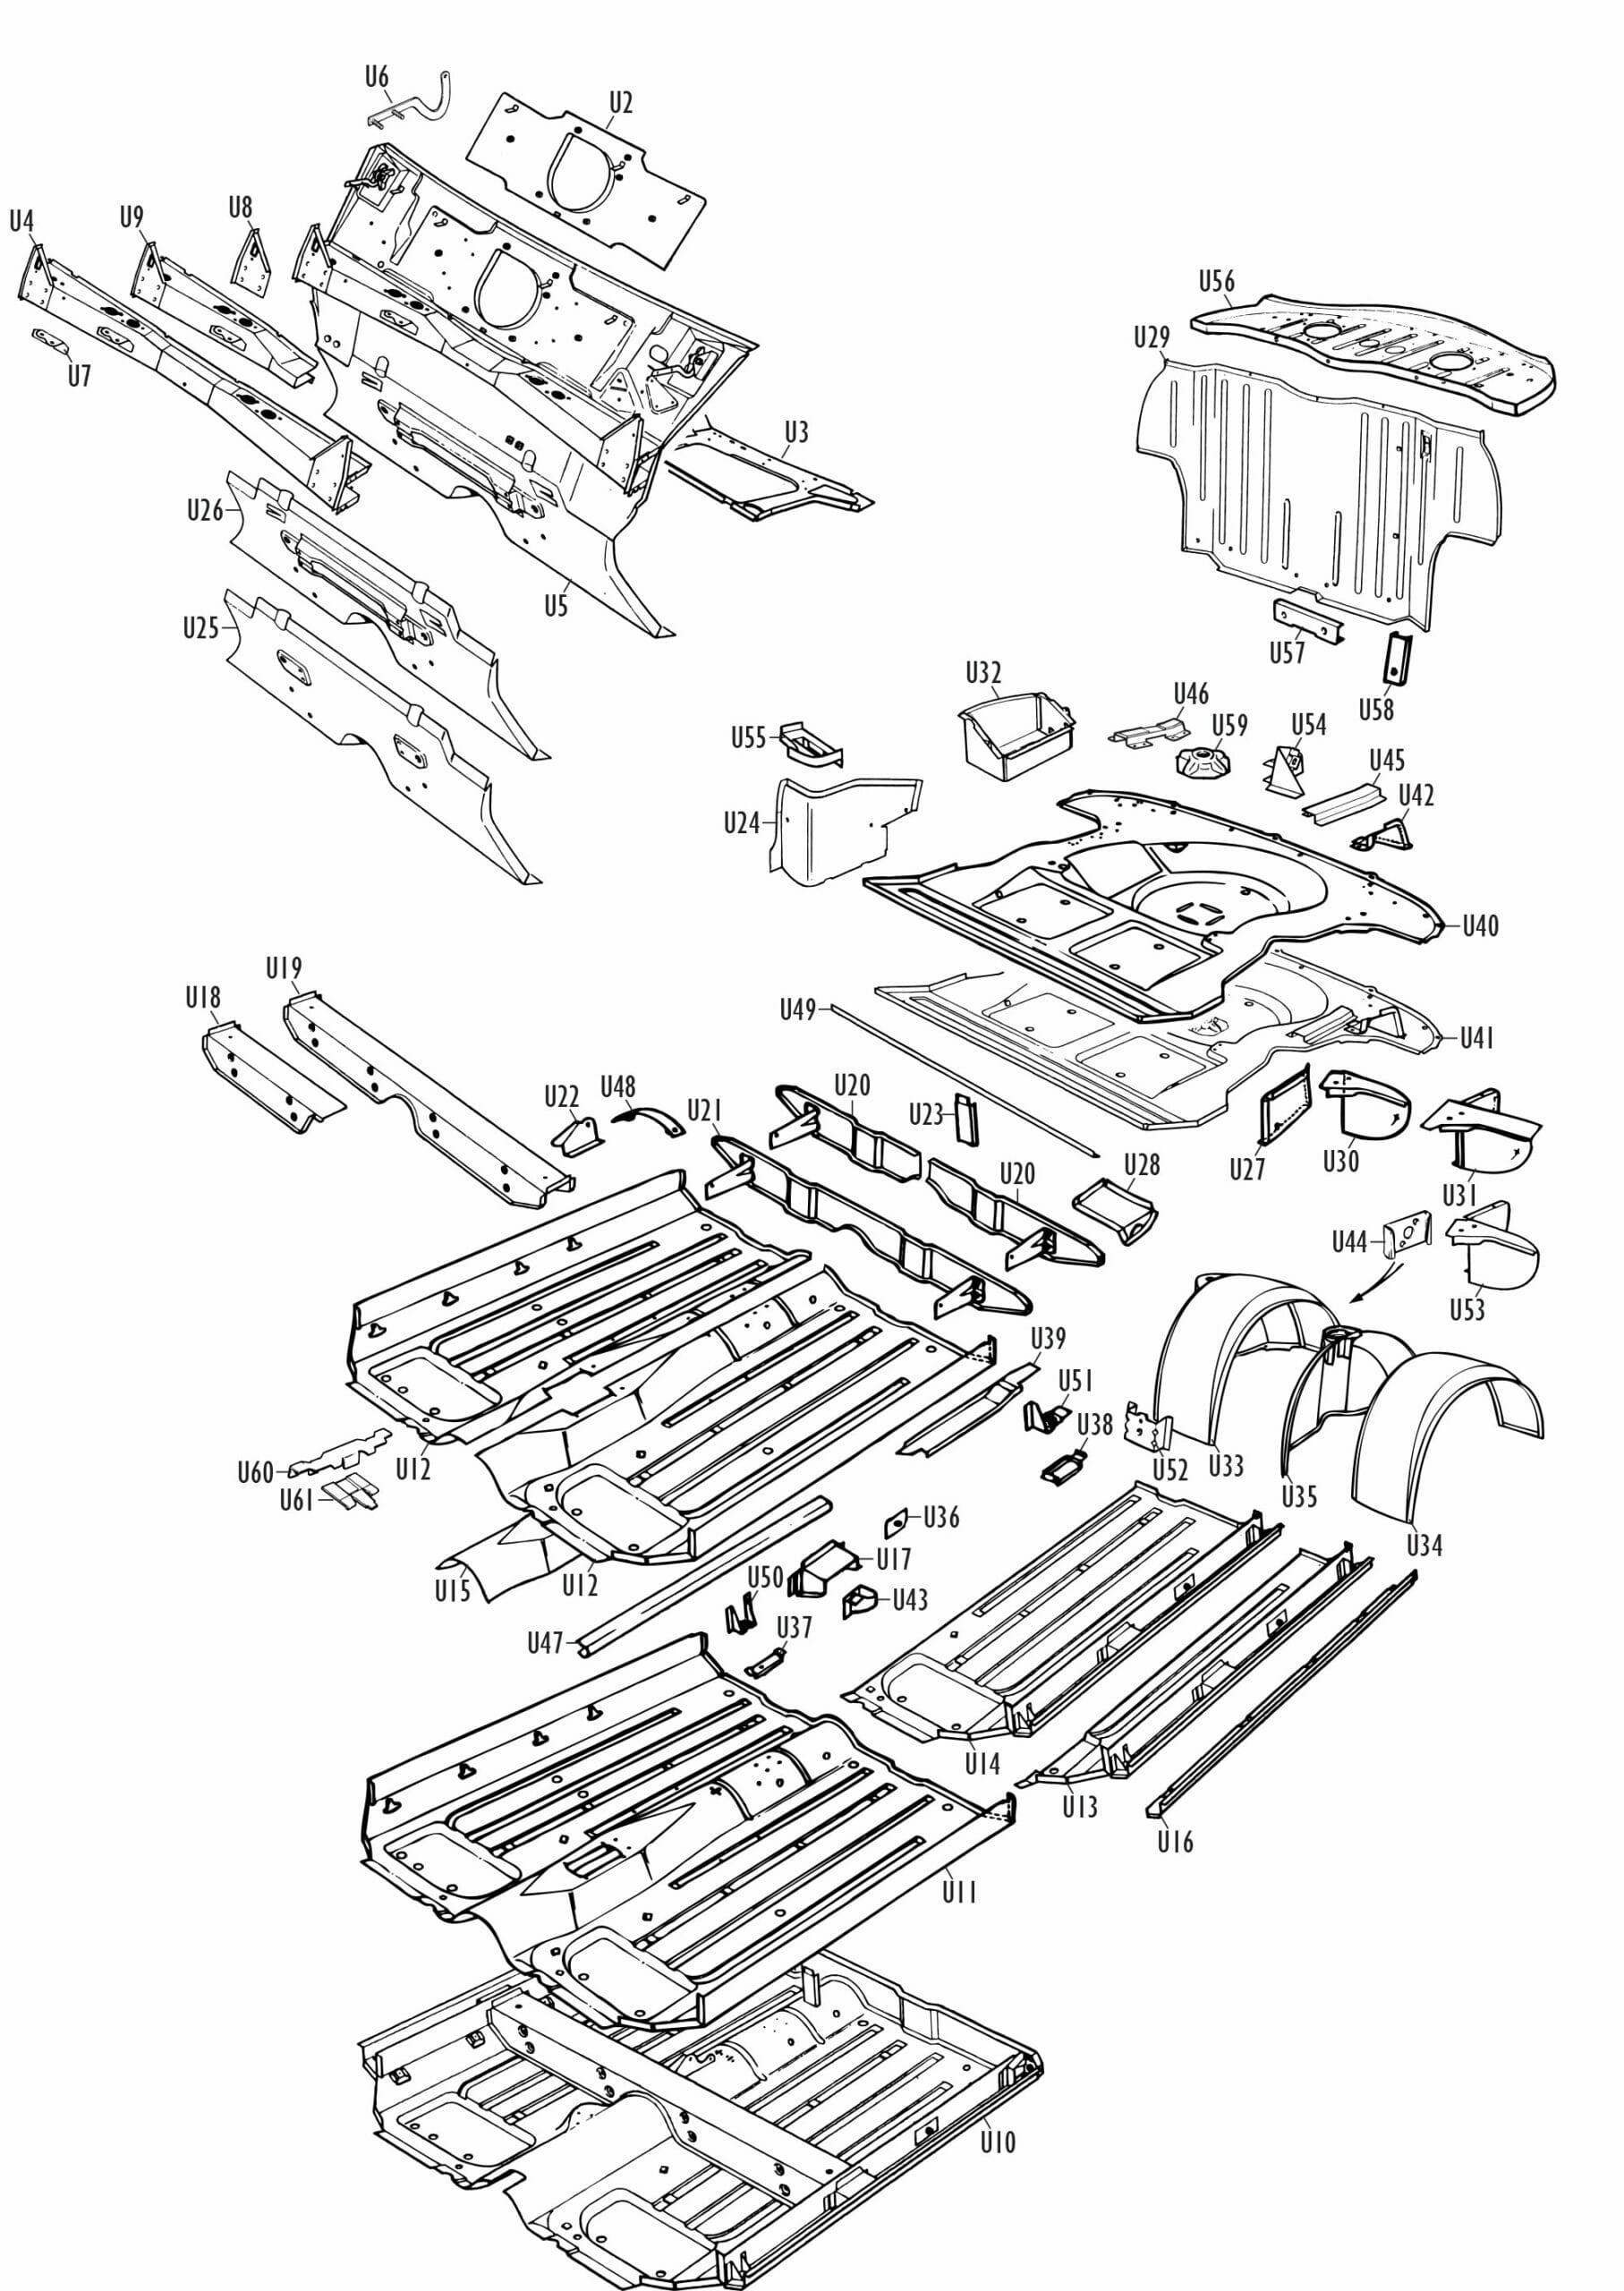 Mini Parts - Underframe